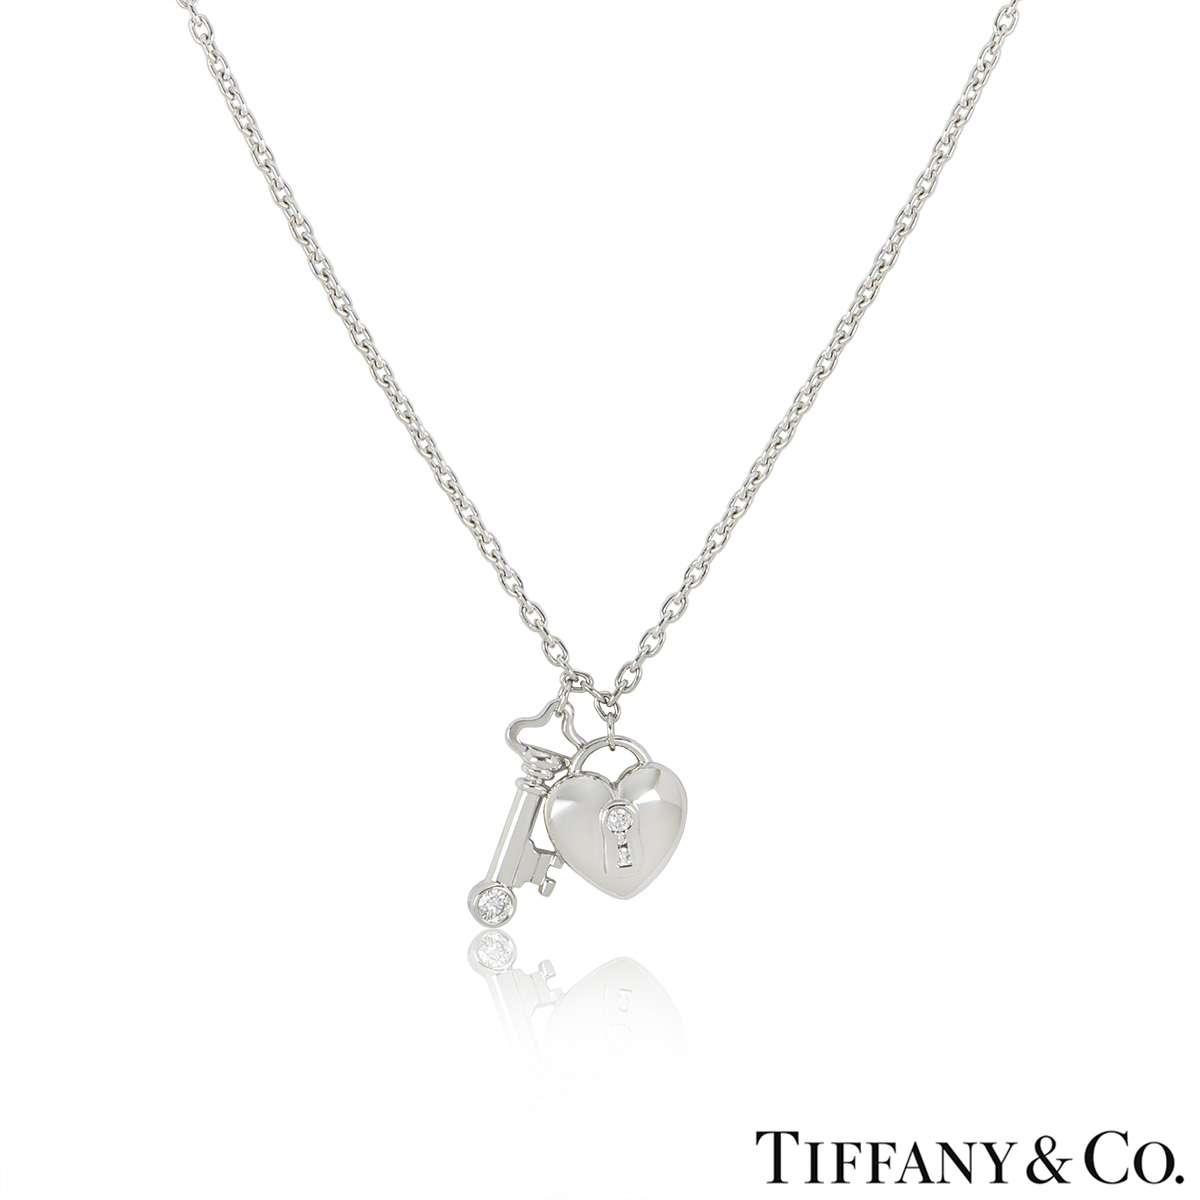 Tiffany & Co. Platinum Diamond Lock & Key Pendant